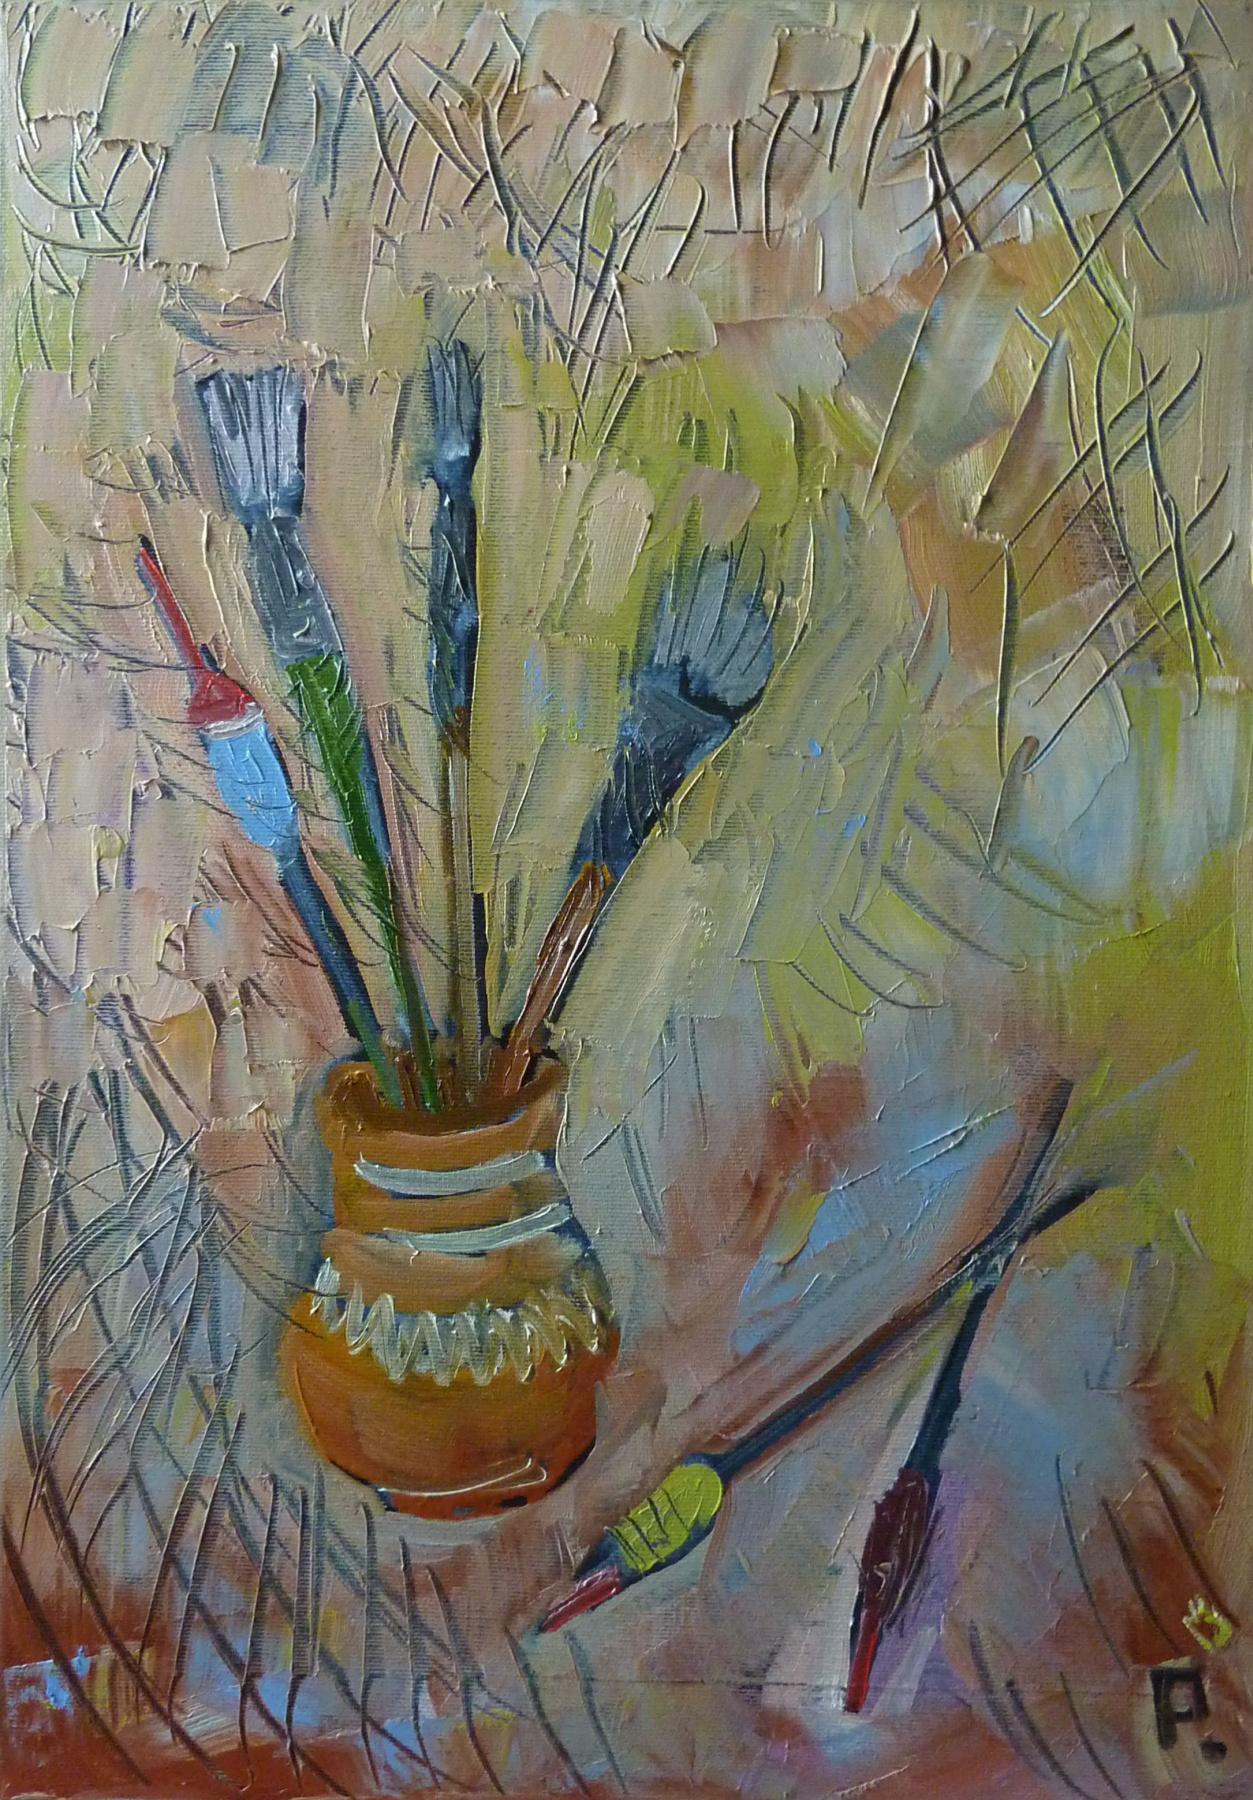 Svyatoslav Ryabkin. Brushes and floats Brushes and floats